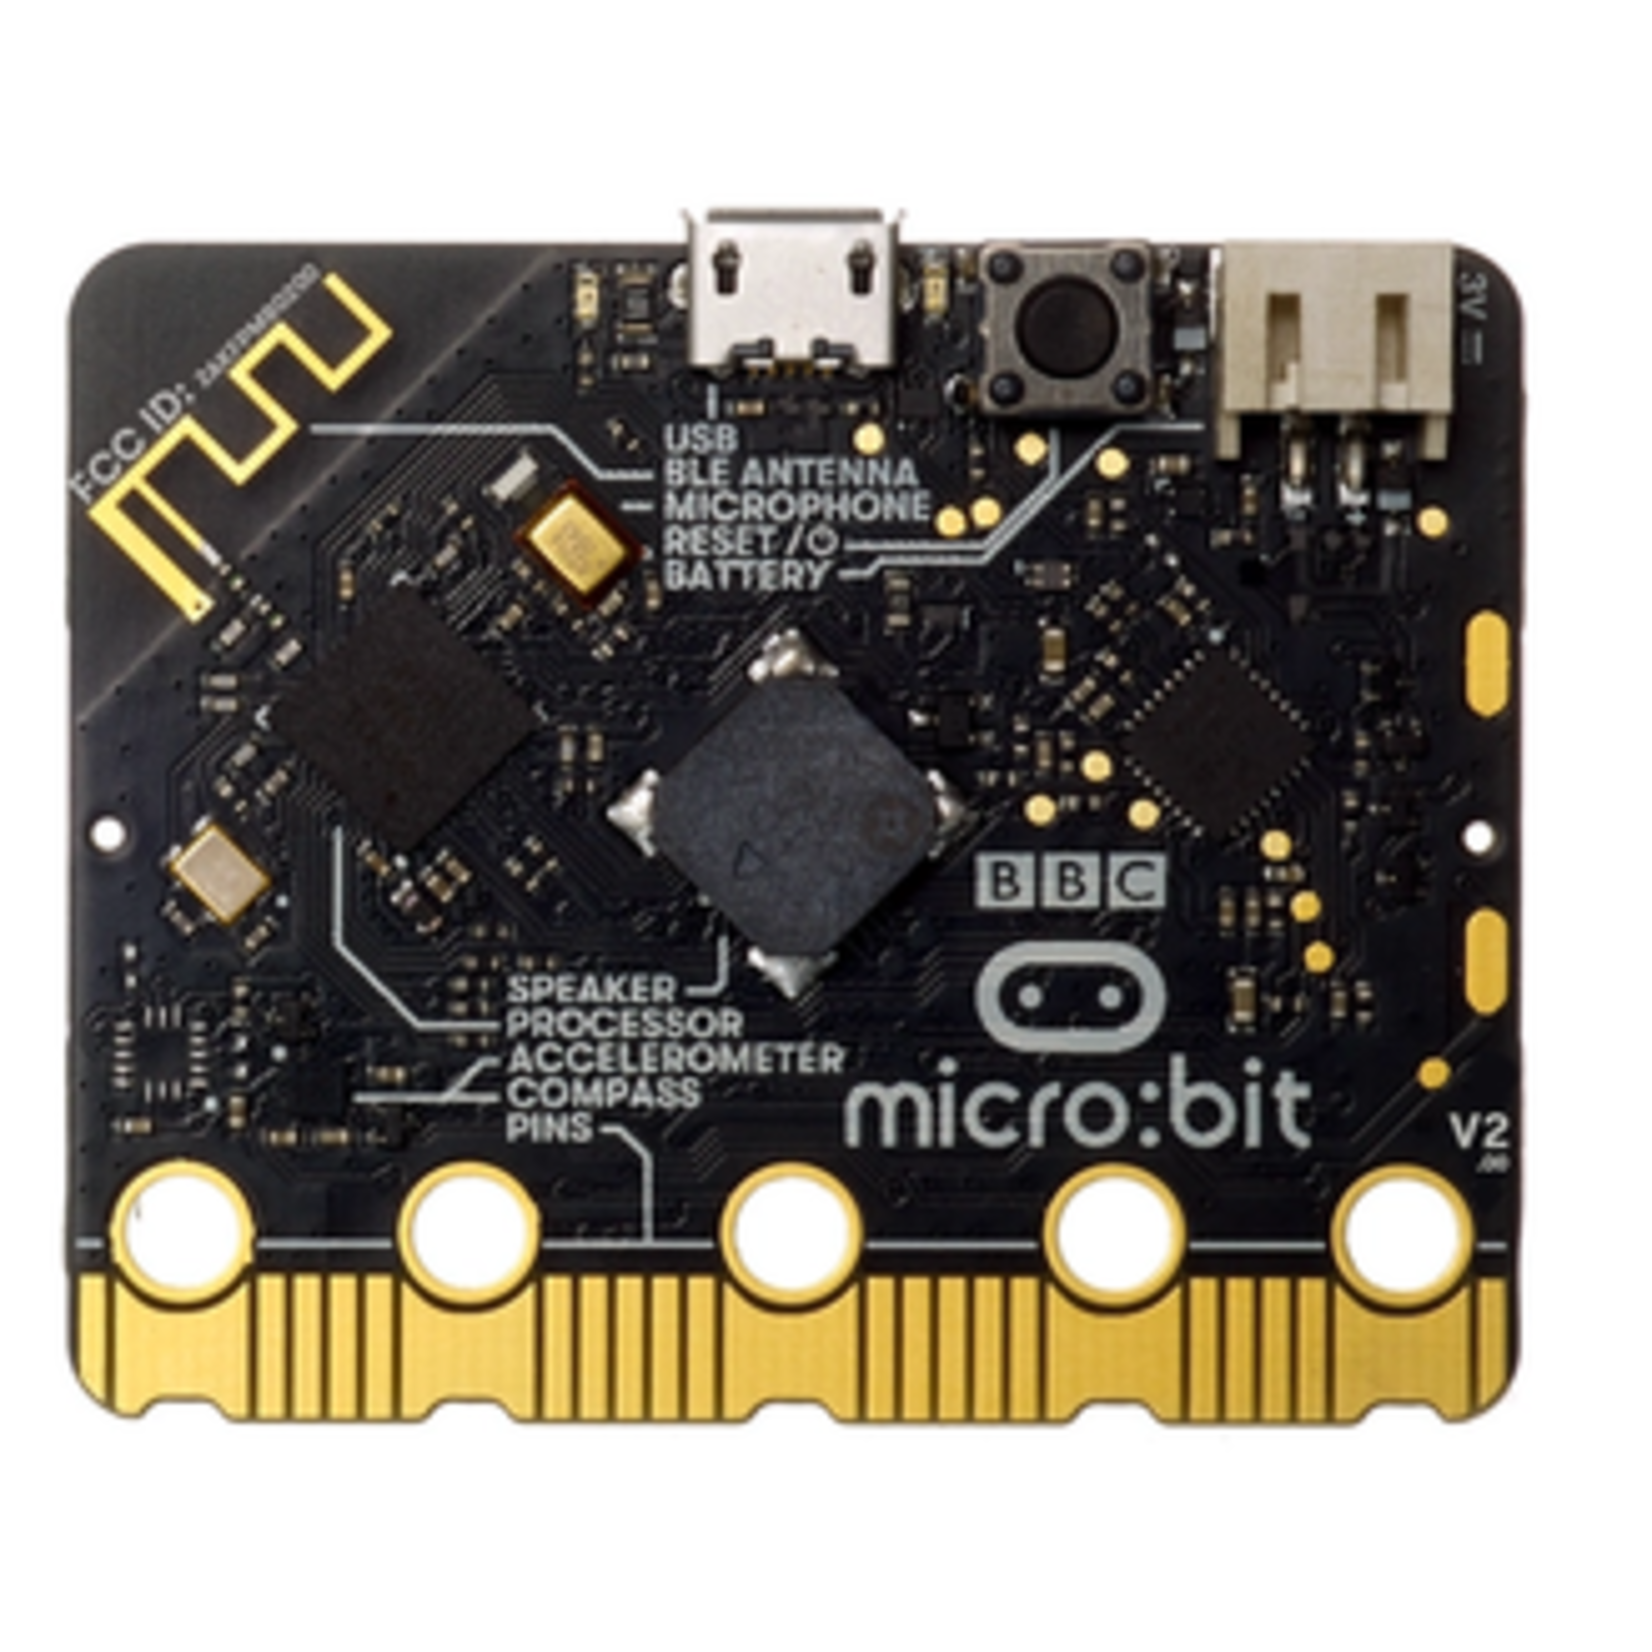 BBC micro:bit Micro:bit V2